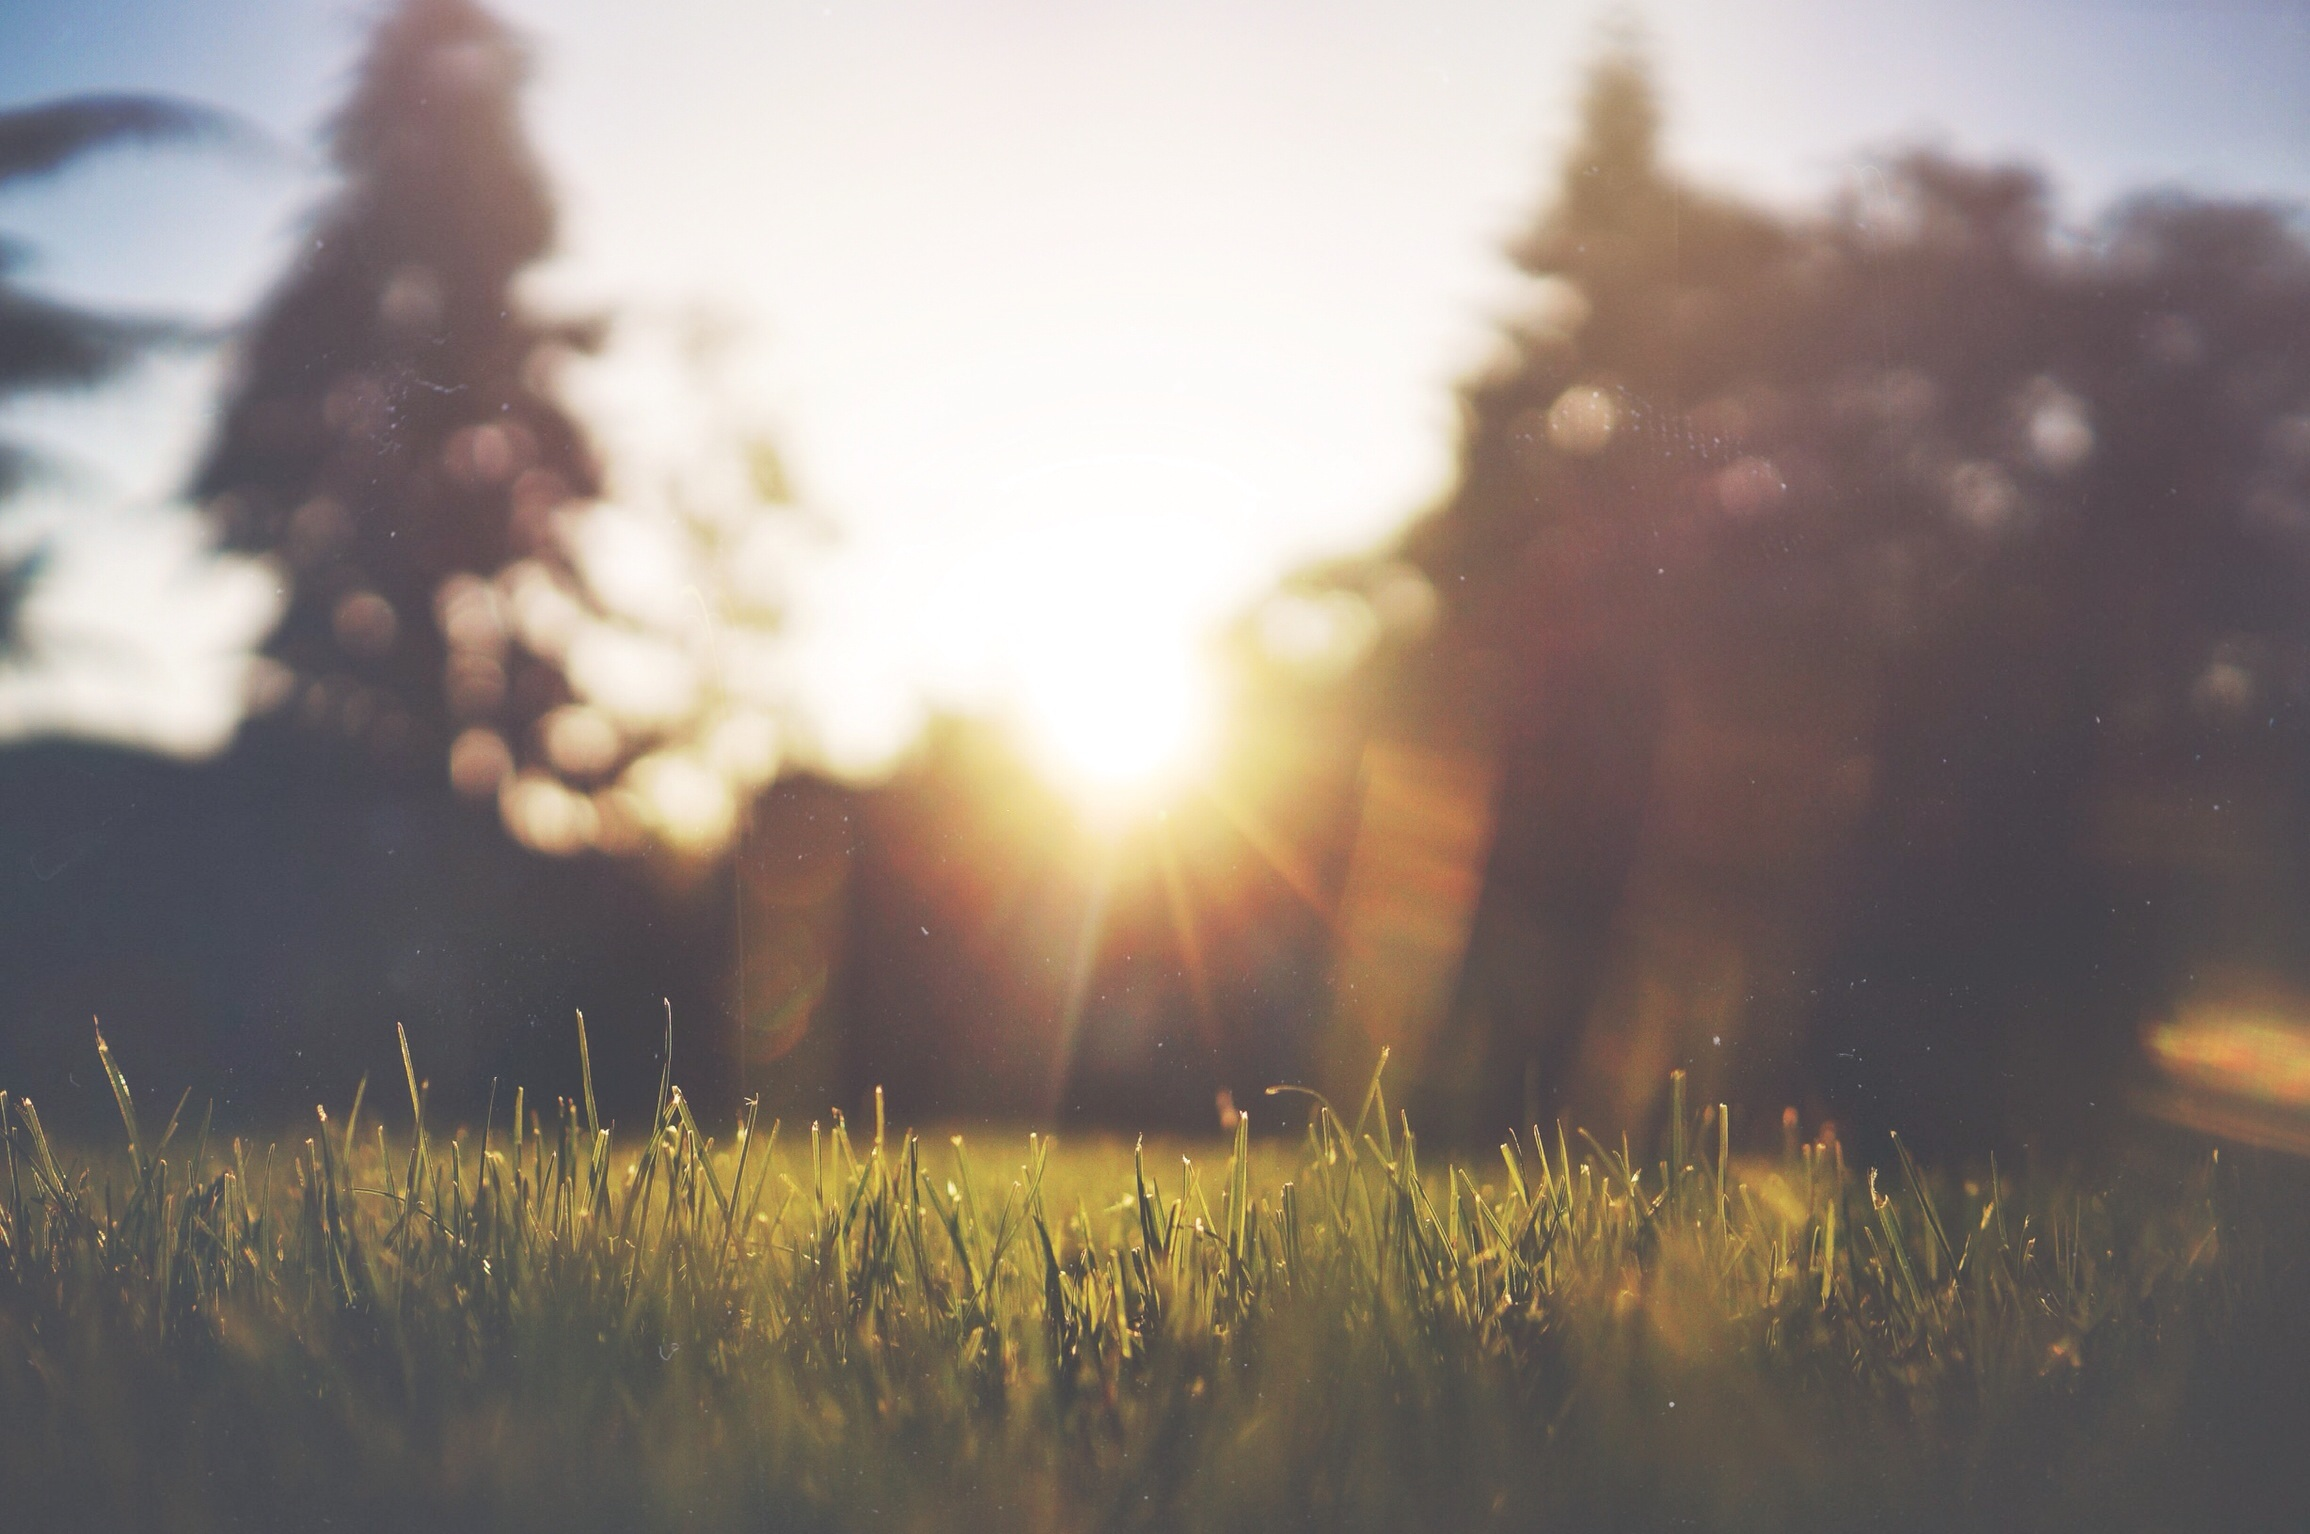 m6rT4MYFQ7CT8j9m2AEC_JakeGivens - Sunset in the Park.JPG